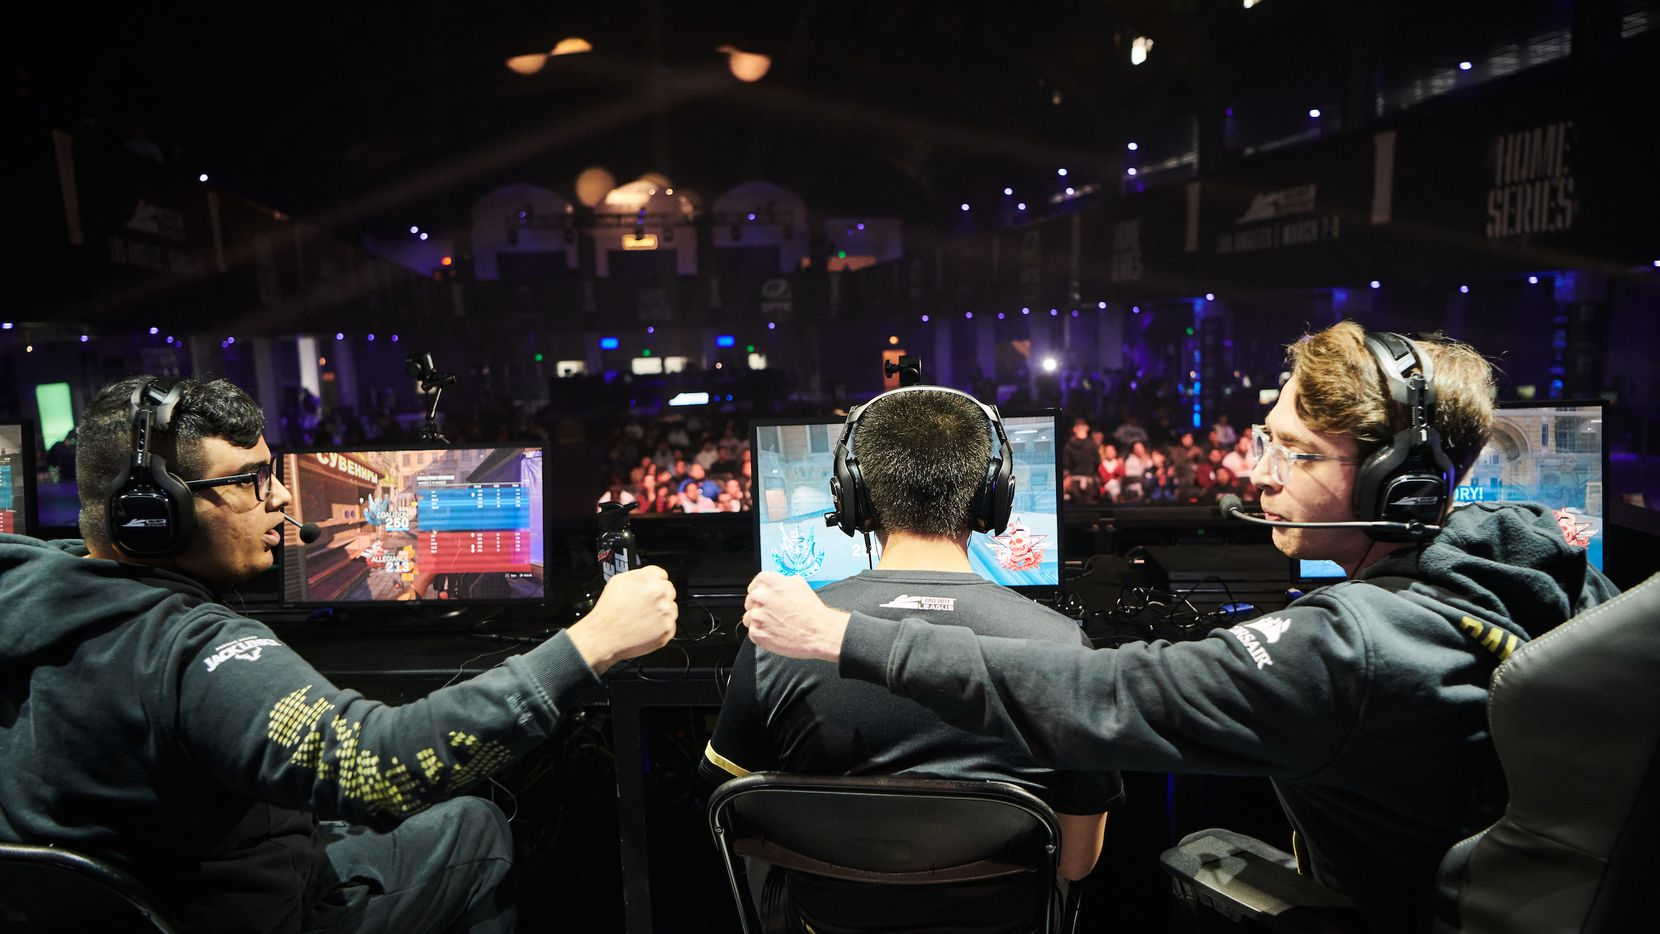 Call of Duty League 2020 Season 2020-03-08 / Photo: Ben Pursell for Activision Blizzard Entertainment